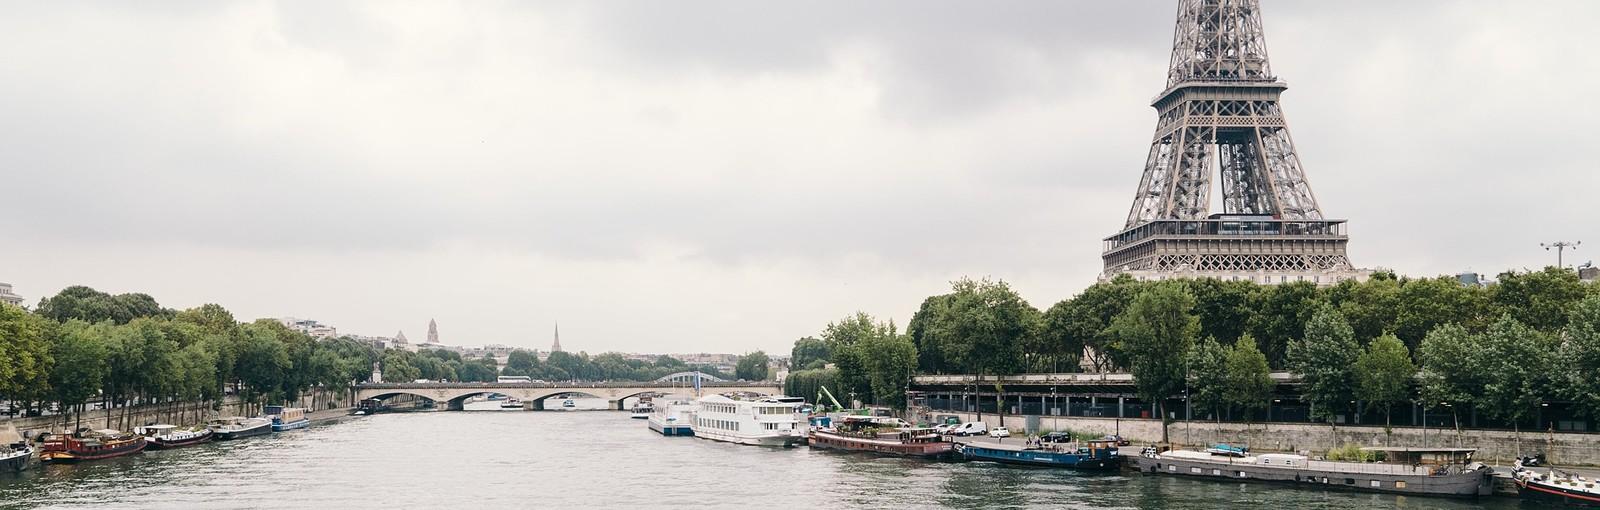 Tours 游览巴黎 - 巴黎市区游 - 巴黎游